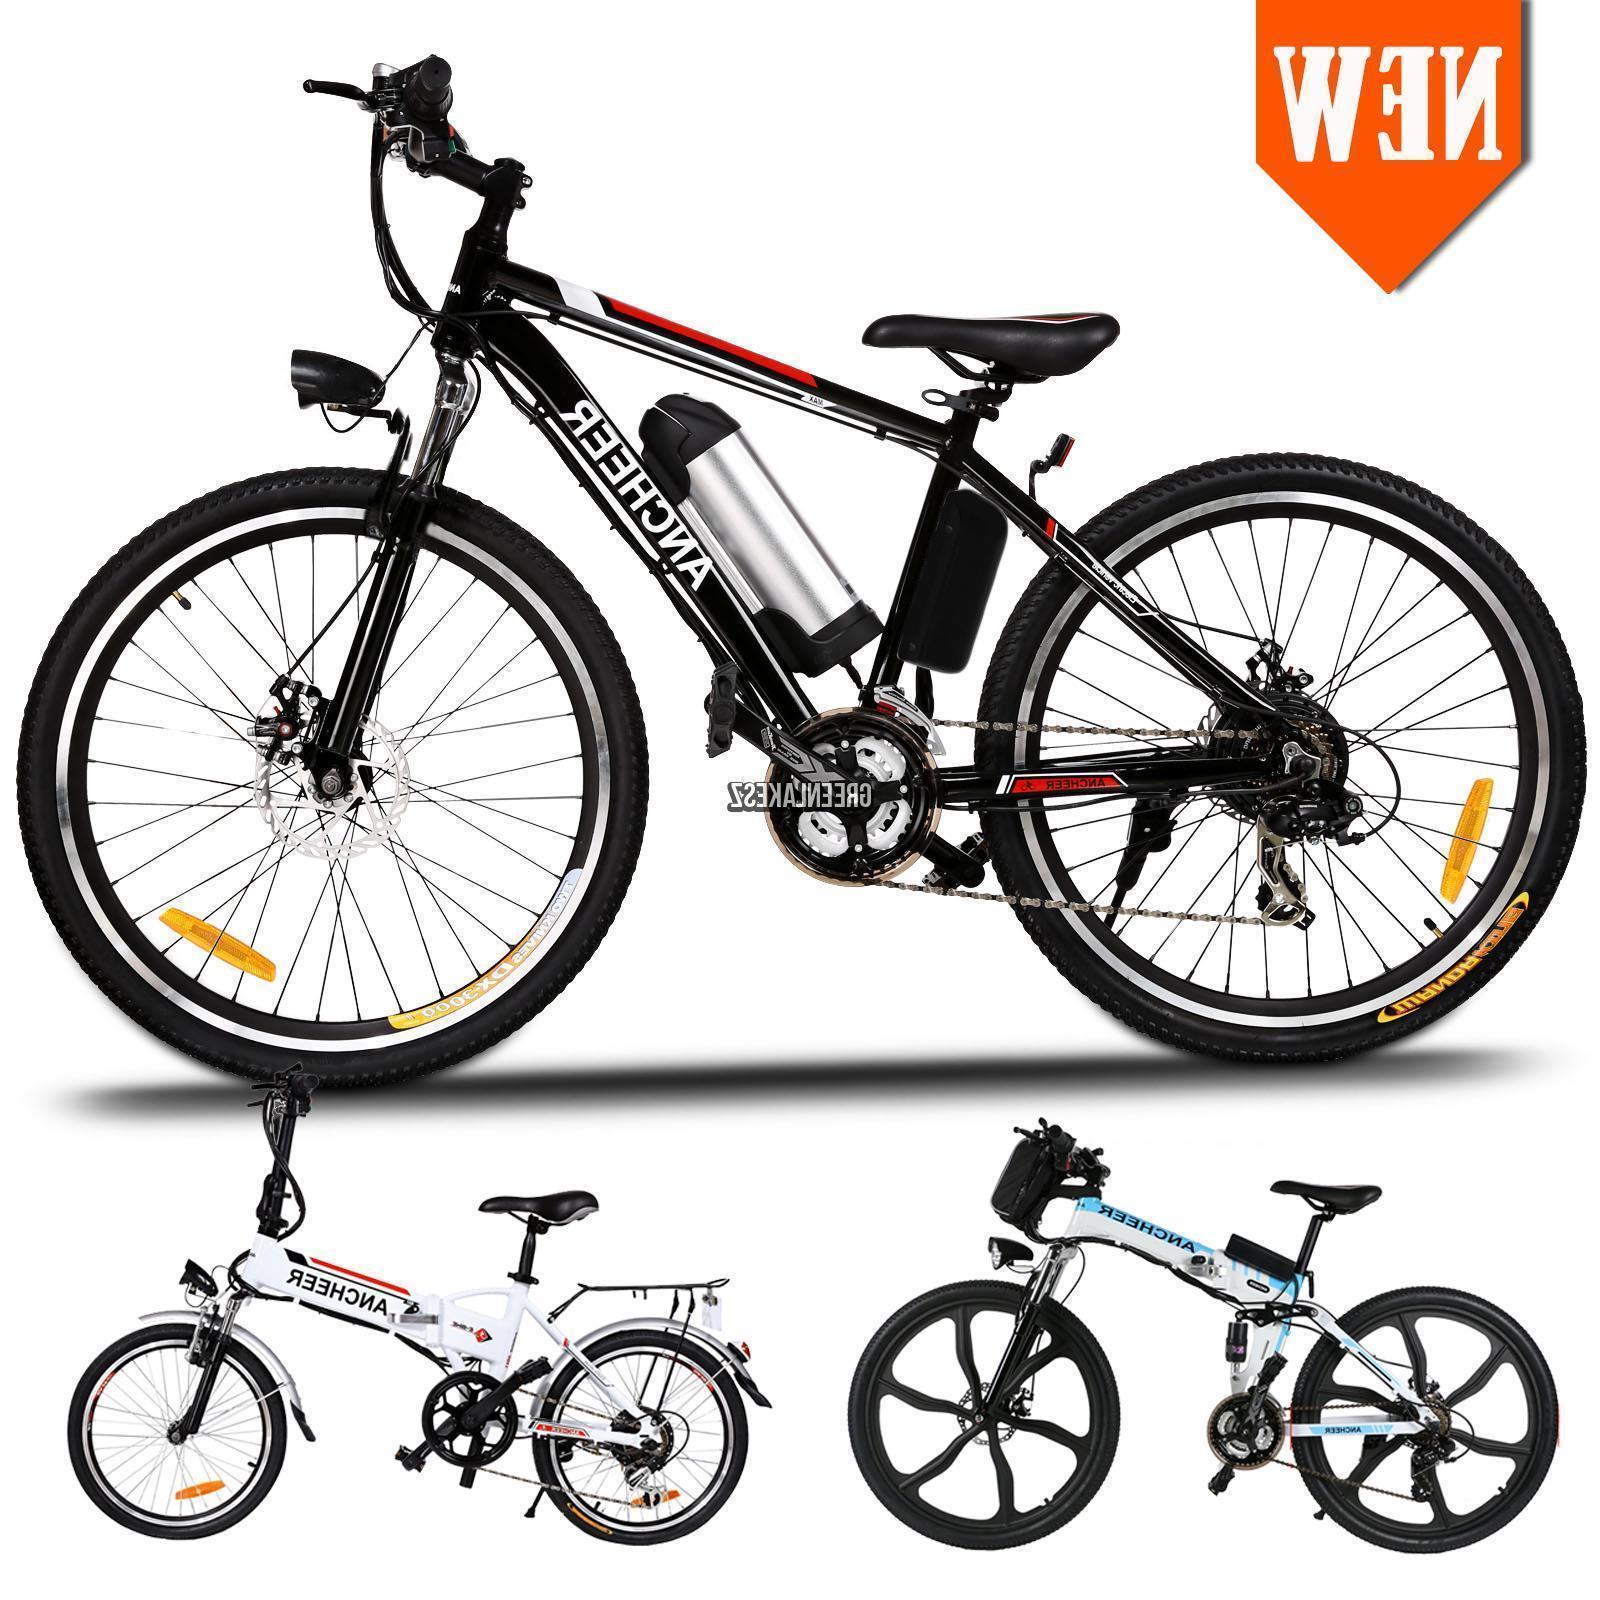 brand new 36v 250w mountain bike electric